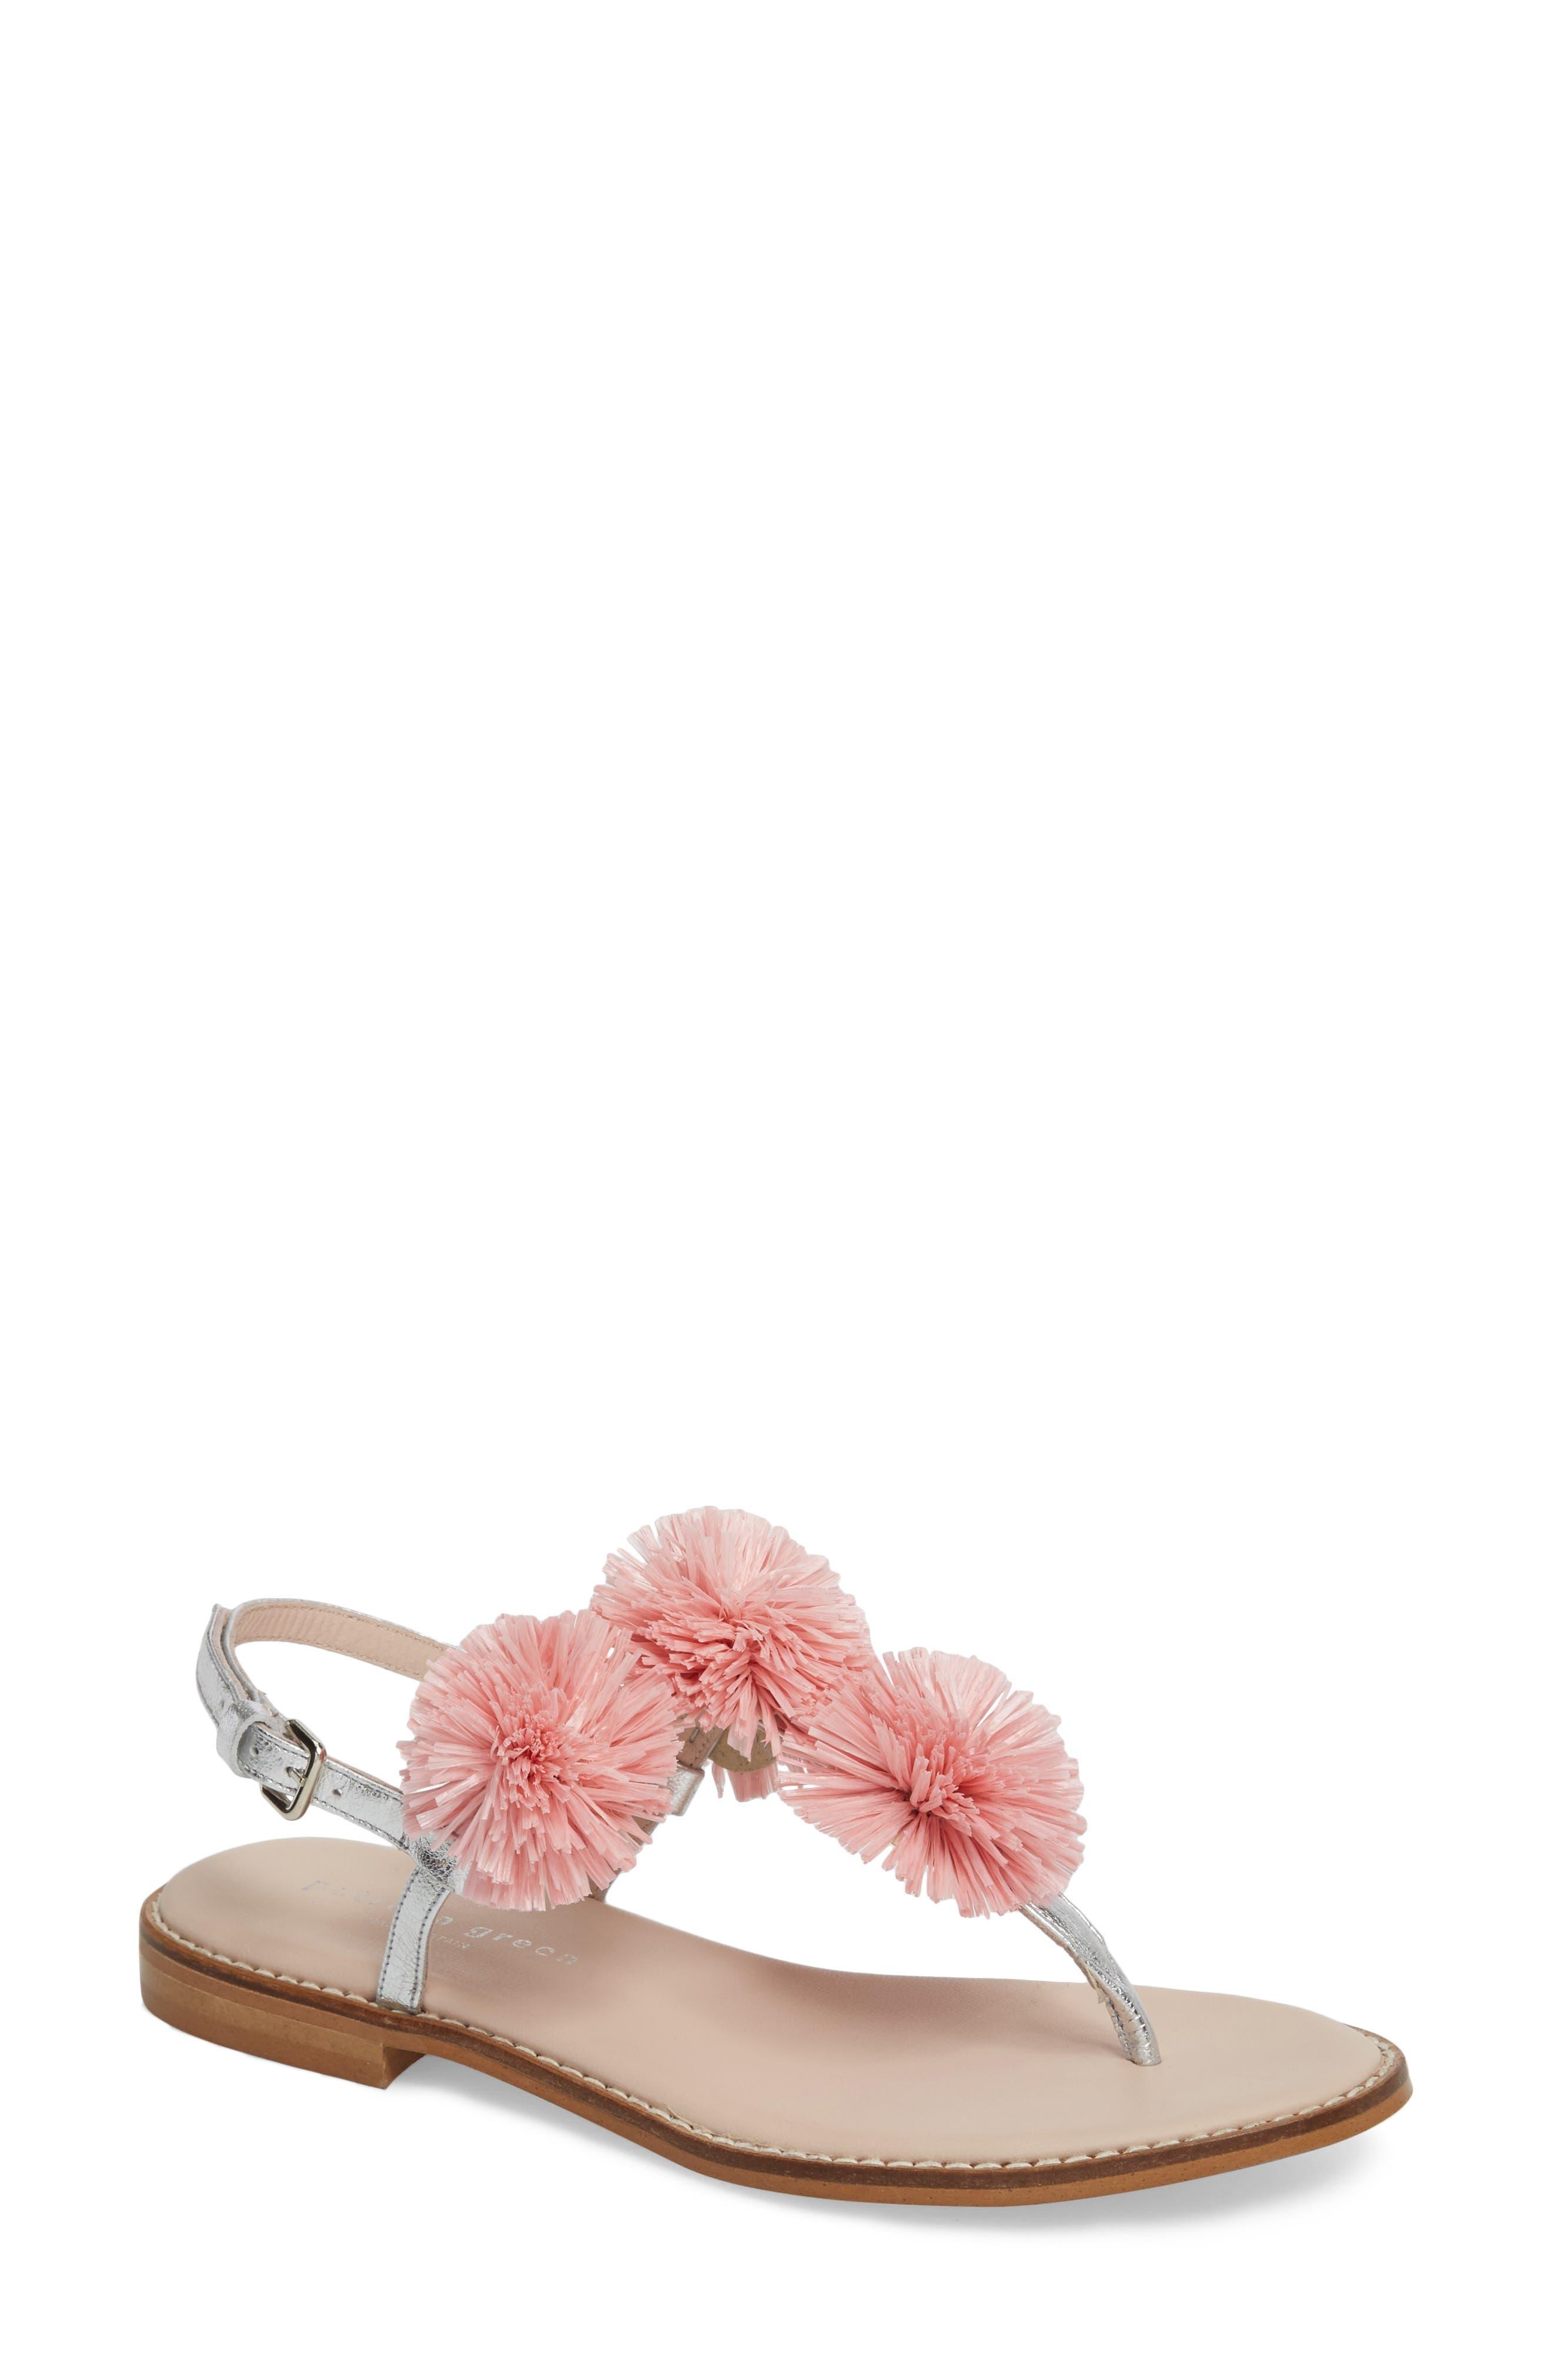 Pompom Thong Sandal,                             Main thumbnail 1, color,                             Pink Leather